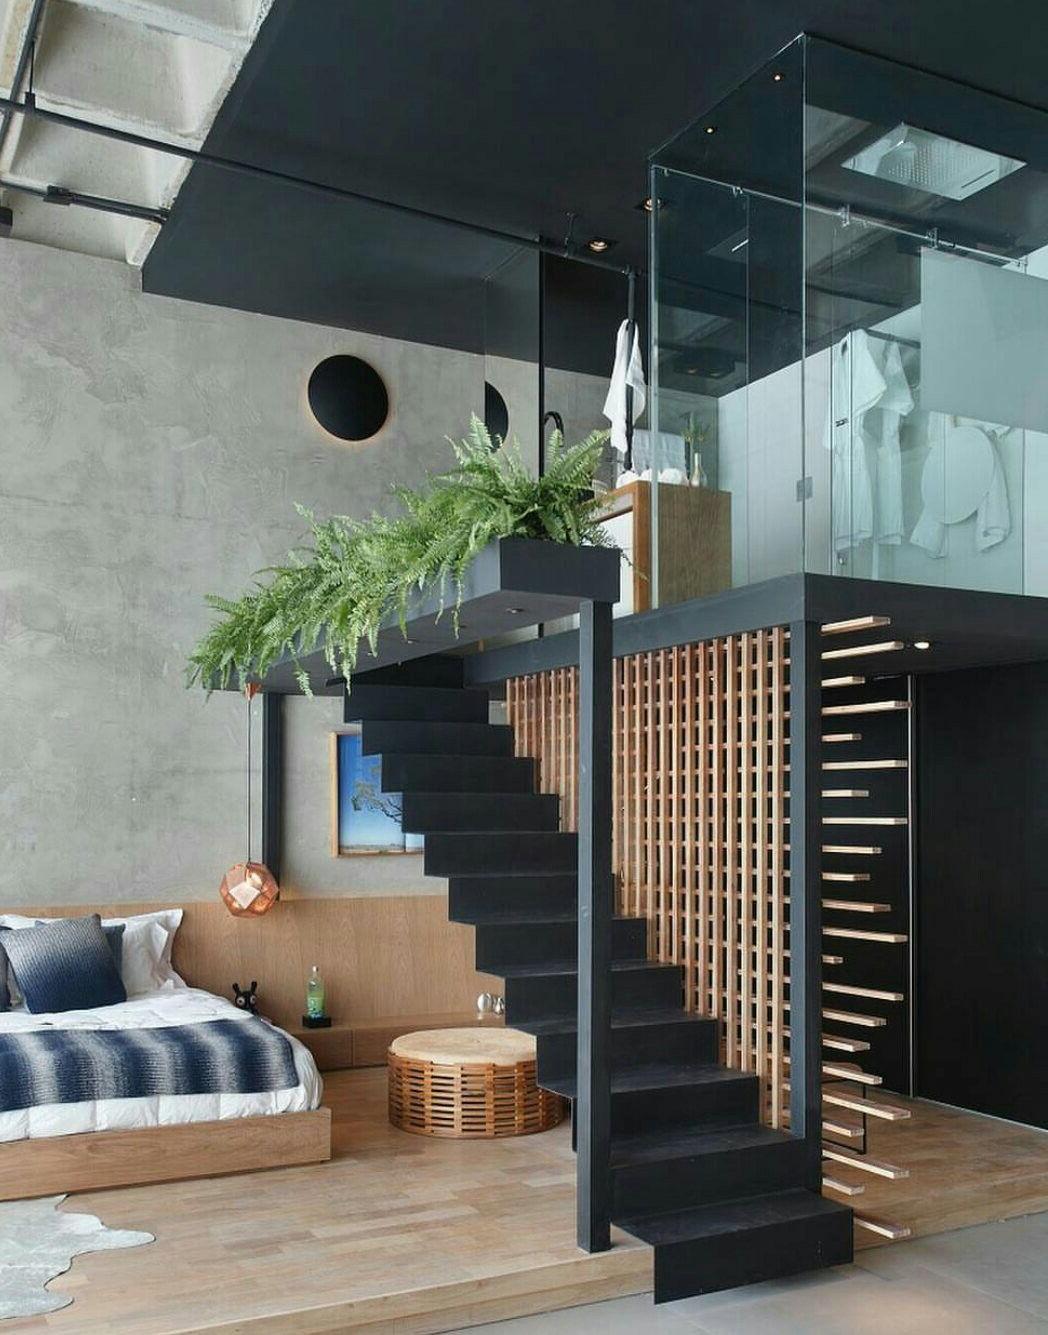 Pin Liz Mulgrew On Lofts Loft Interiors Staircase